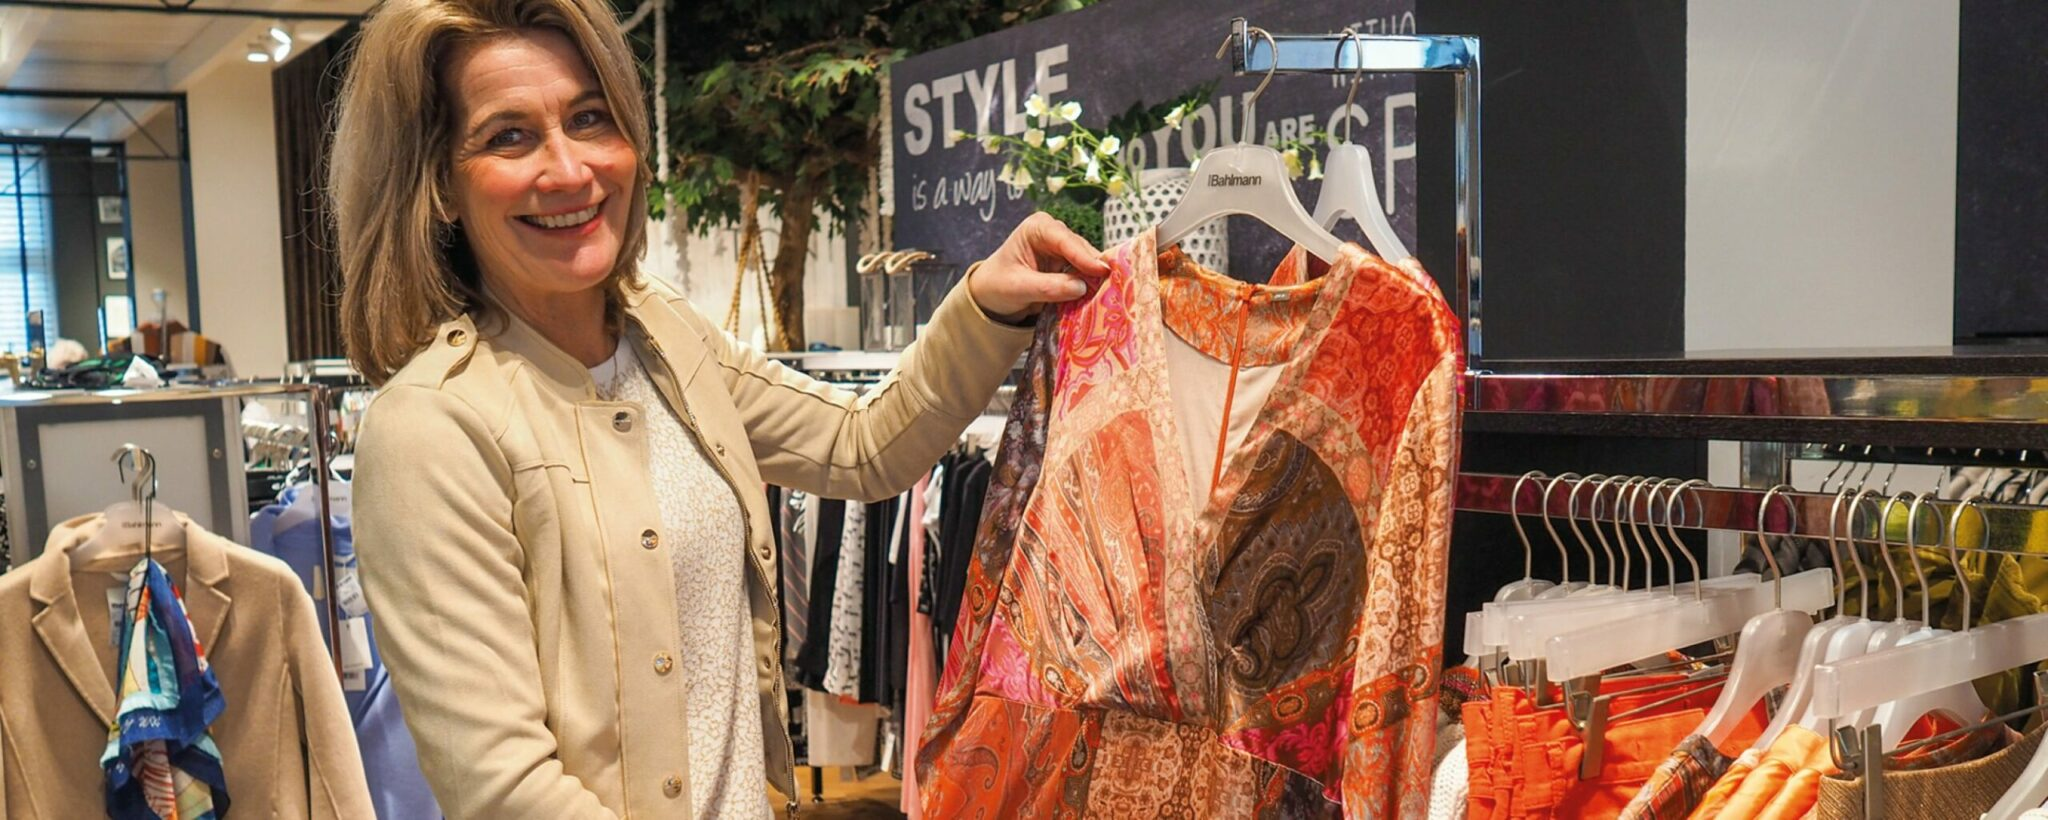 Yvonne Wooldrik Bahlmann Mode personal shopping shopper winkelen op afspraak Dordrecht Voorstraat dameskleding